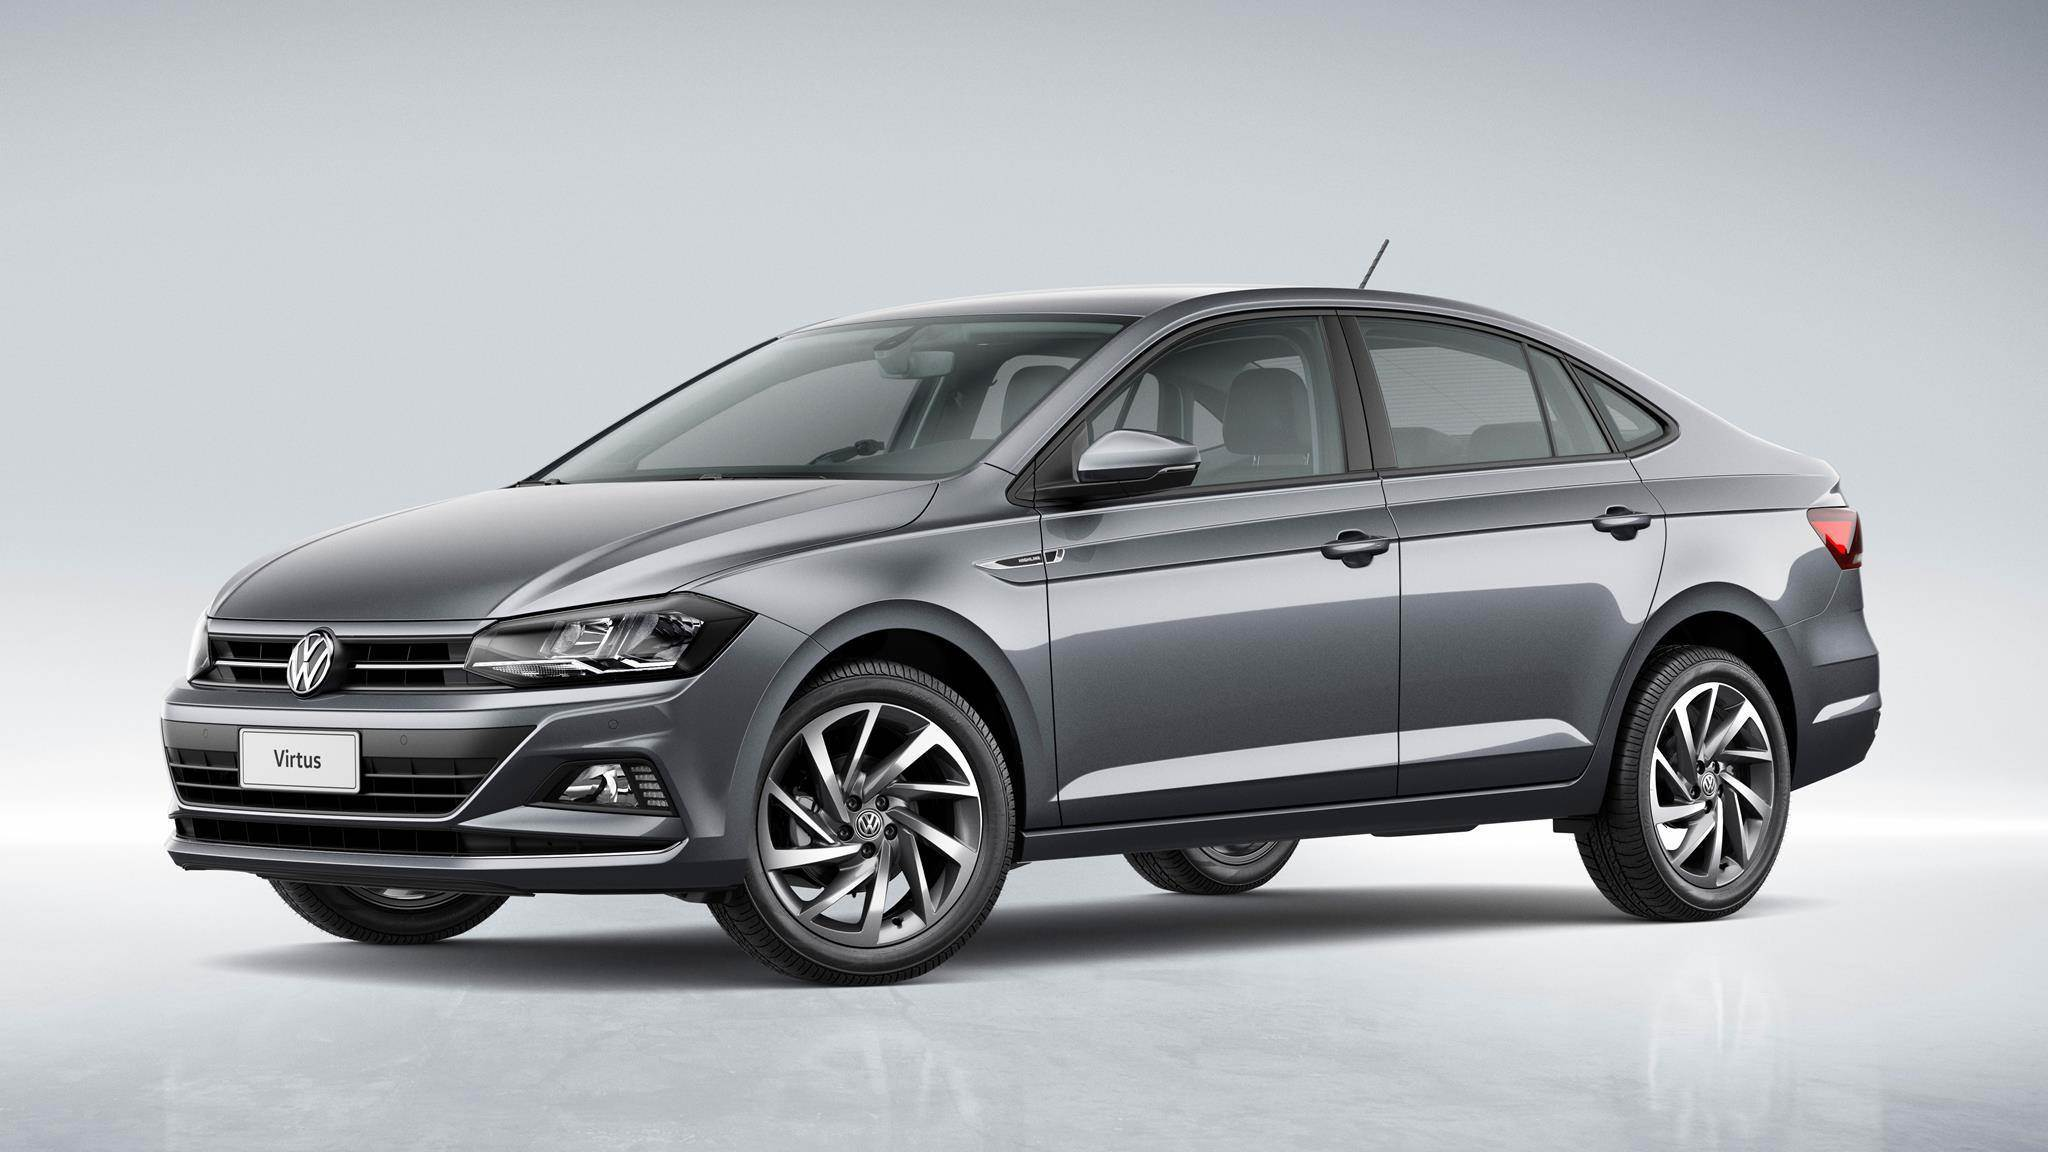 2018 Volkswagen Virtus image gallery